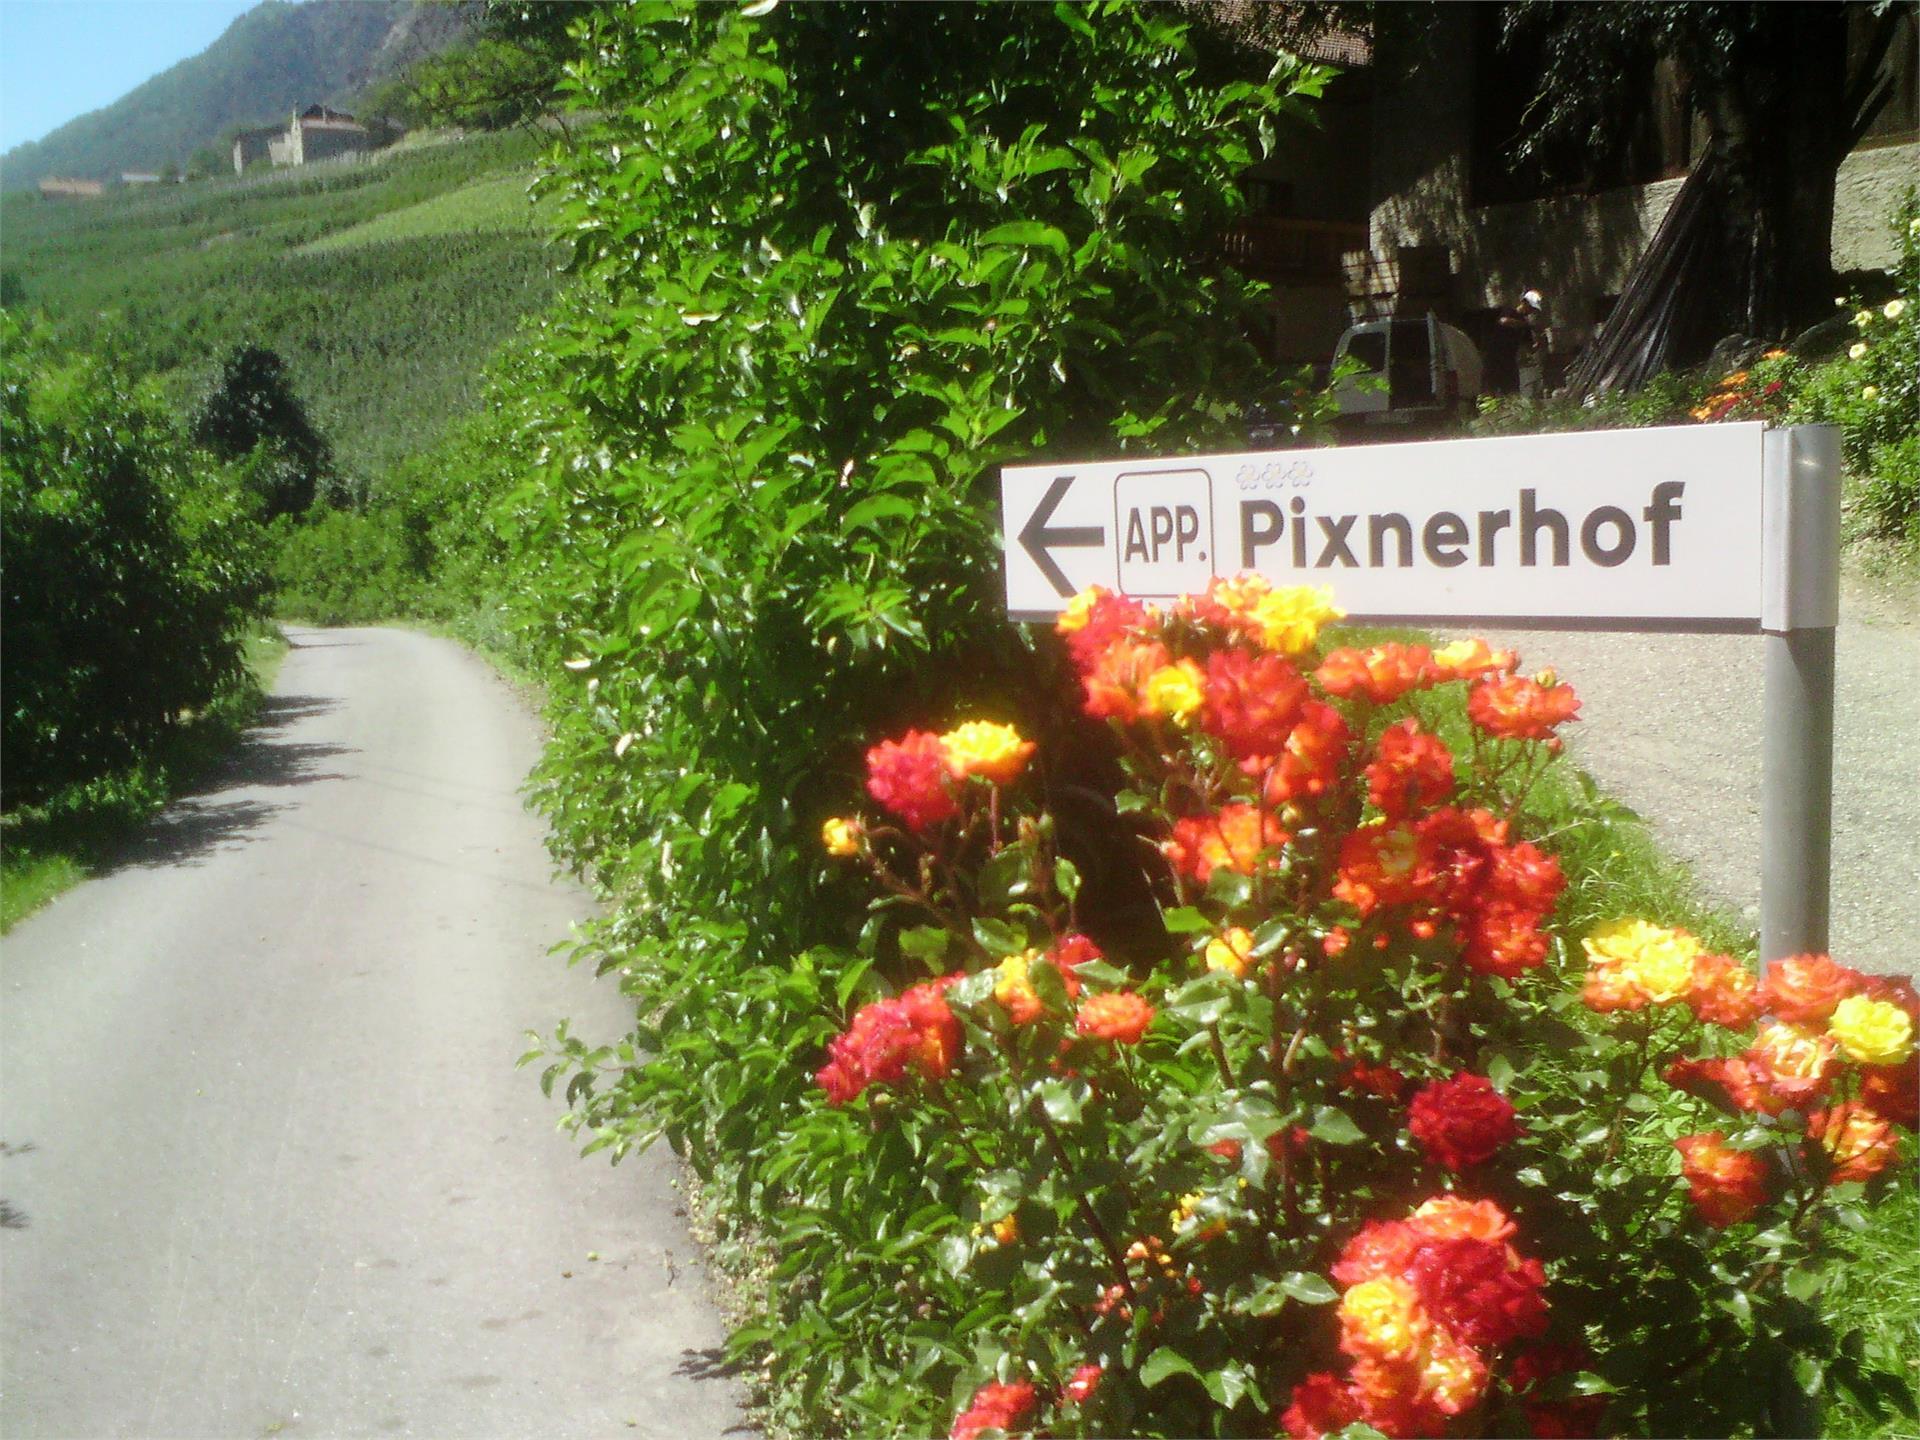 Strada d'accesso al Pixnerhof